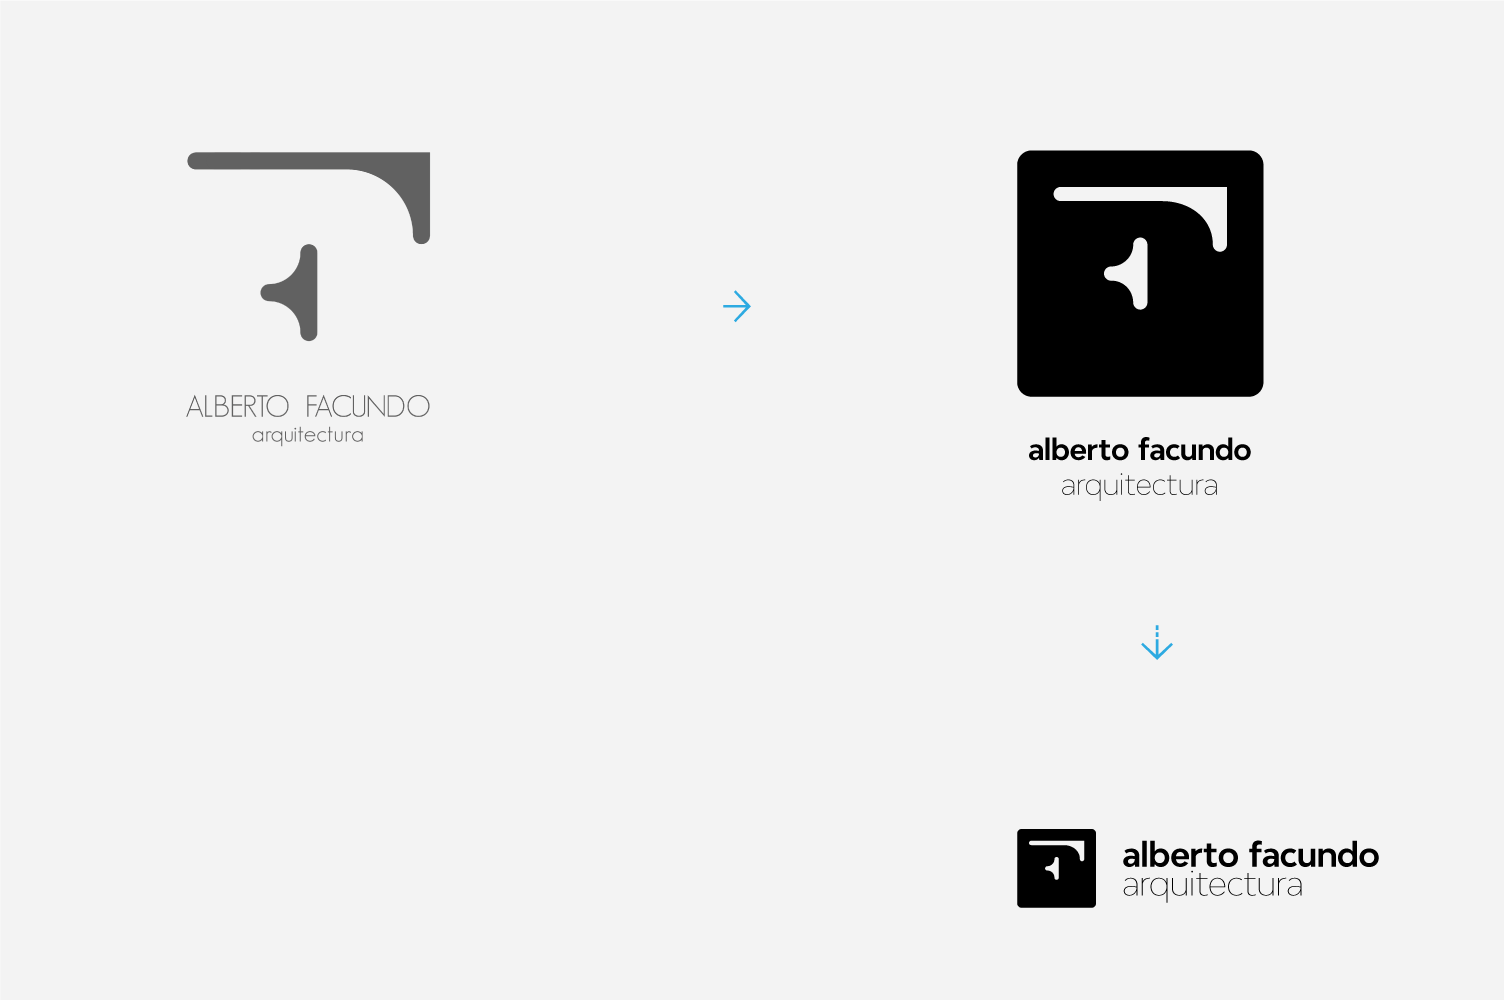 Rediseño de marca Alberto Facundo arquitectura